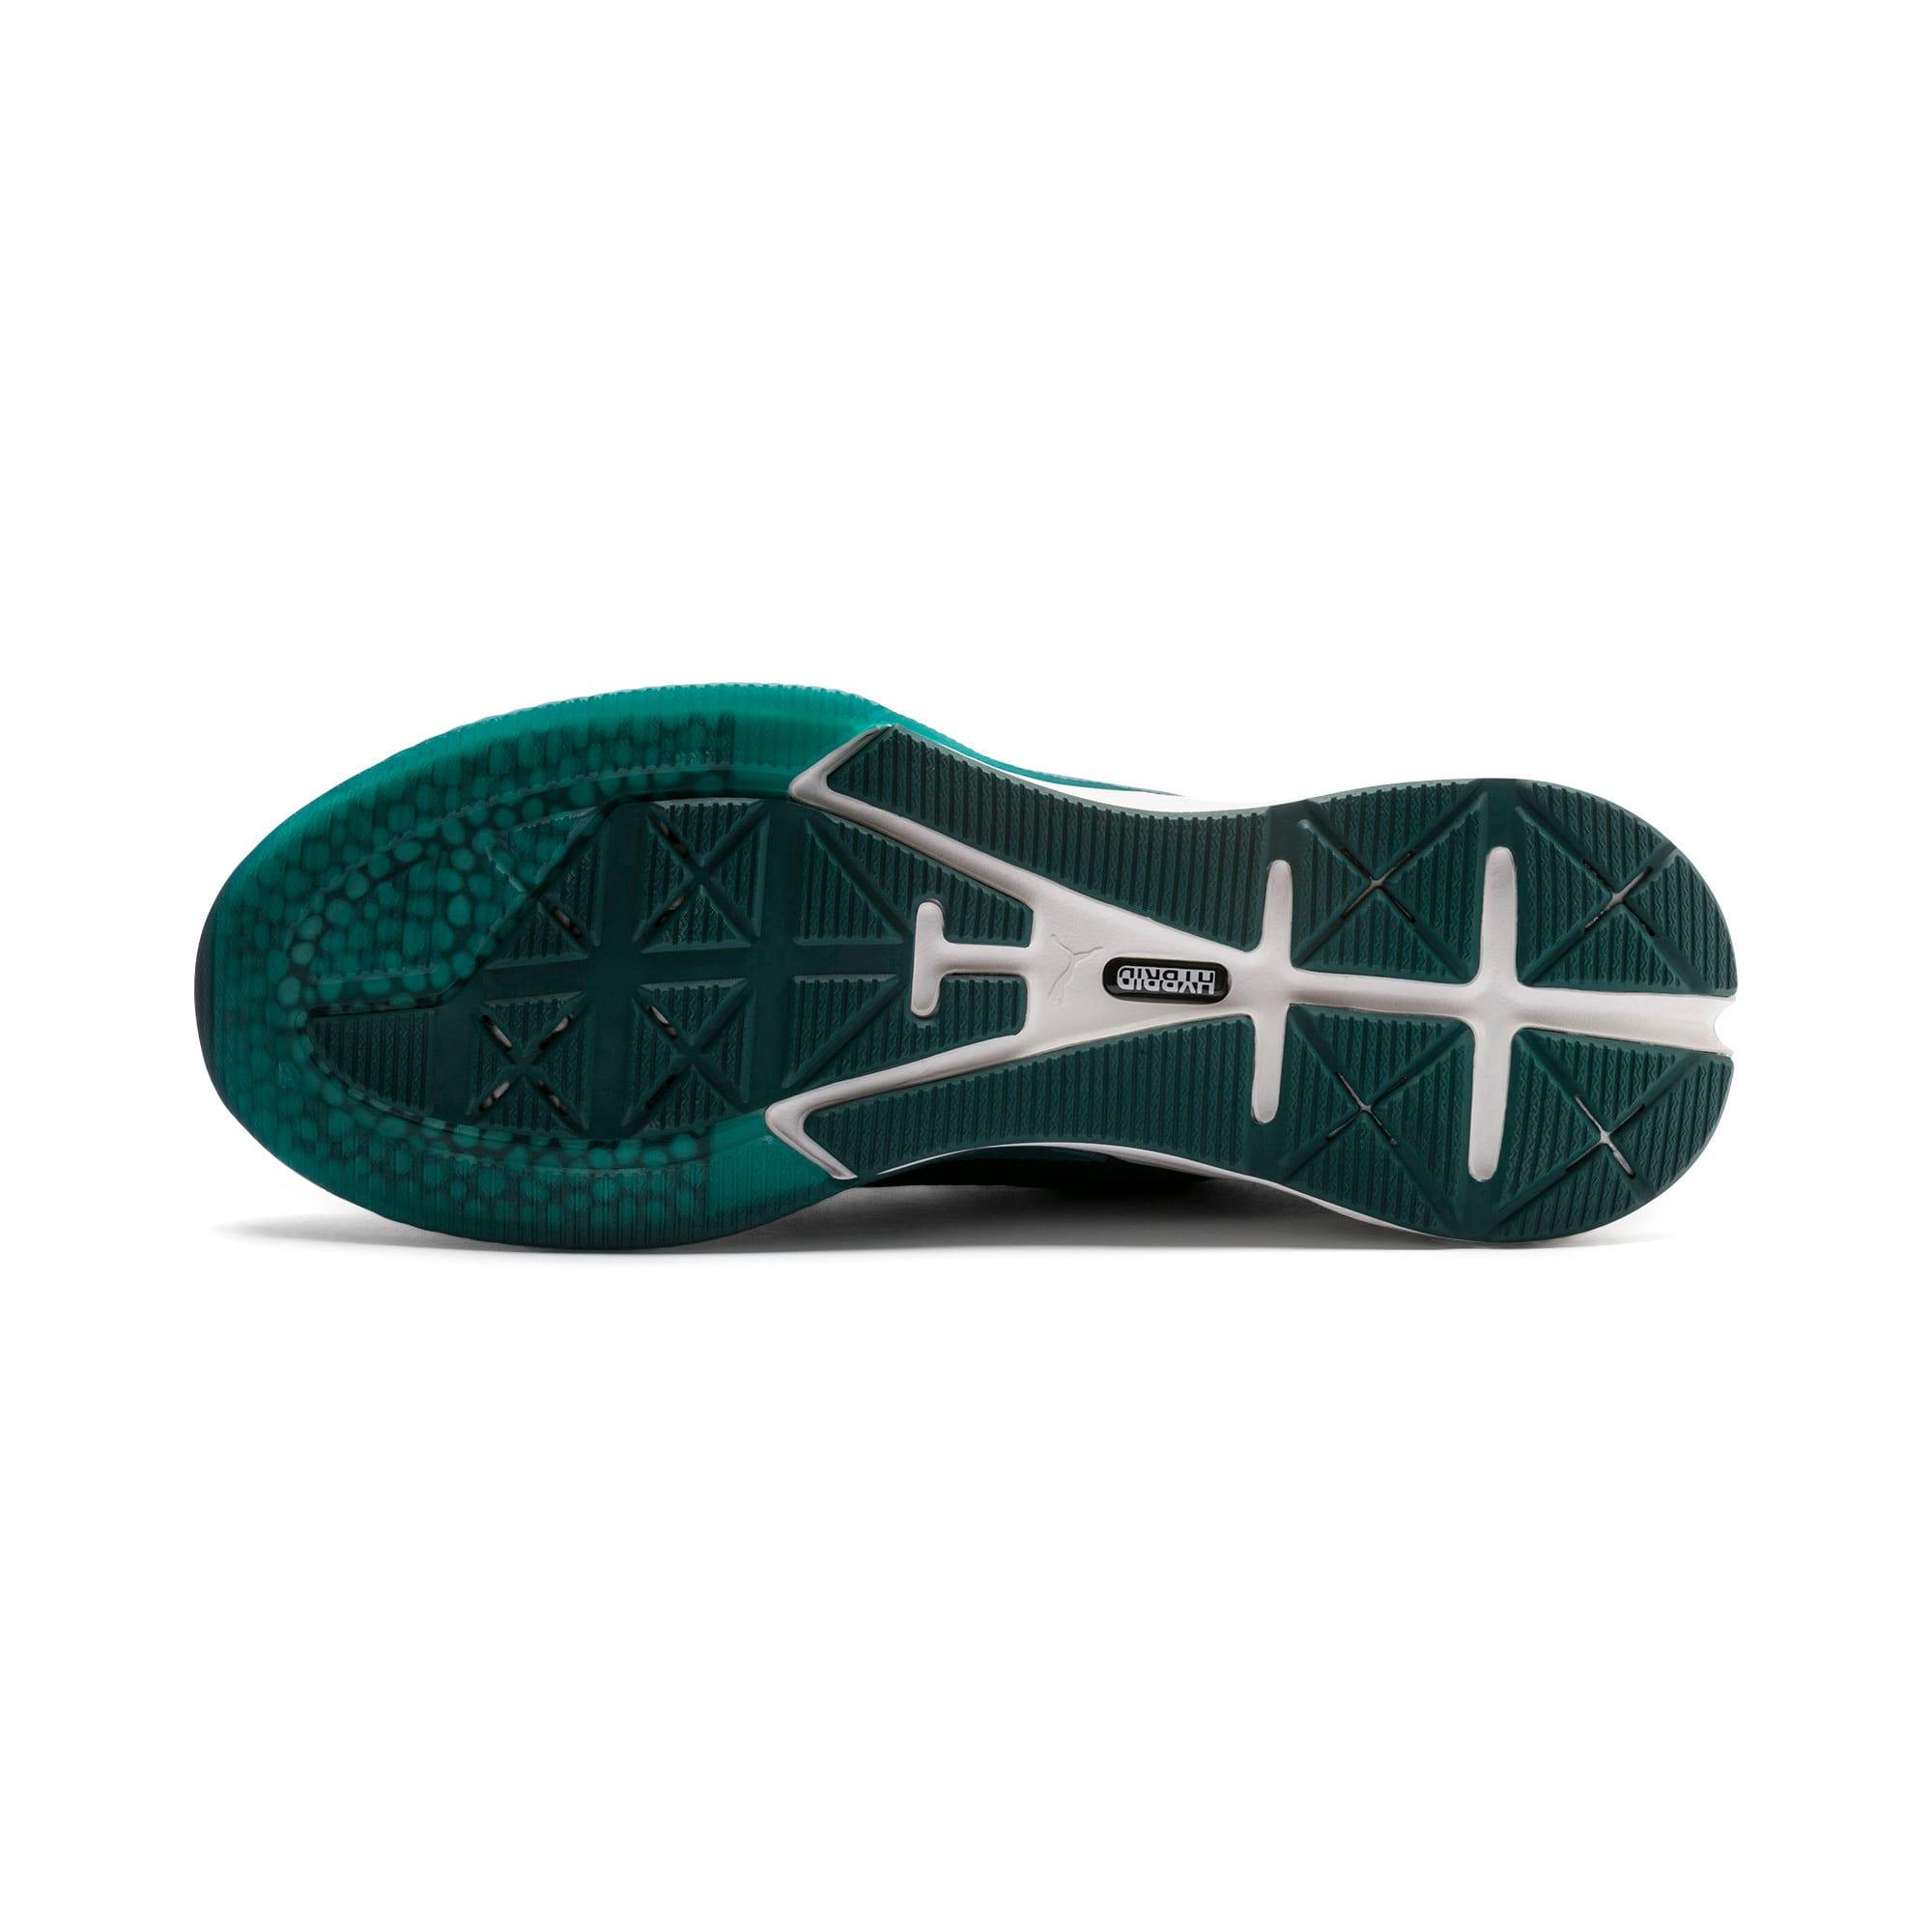 Thumbnail 5 of Xcelerator Men's Sneakers, Black-Glacier Gray-Ponderosa, medium